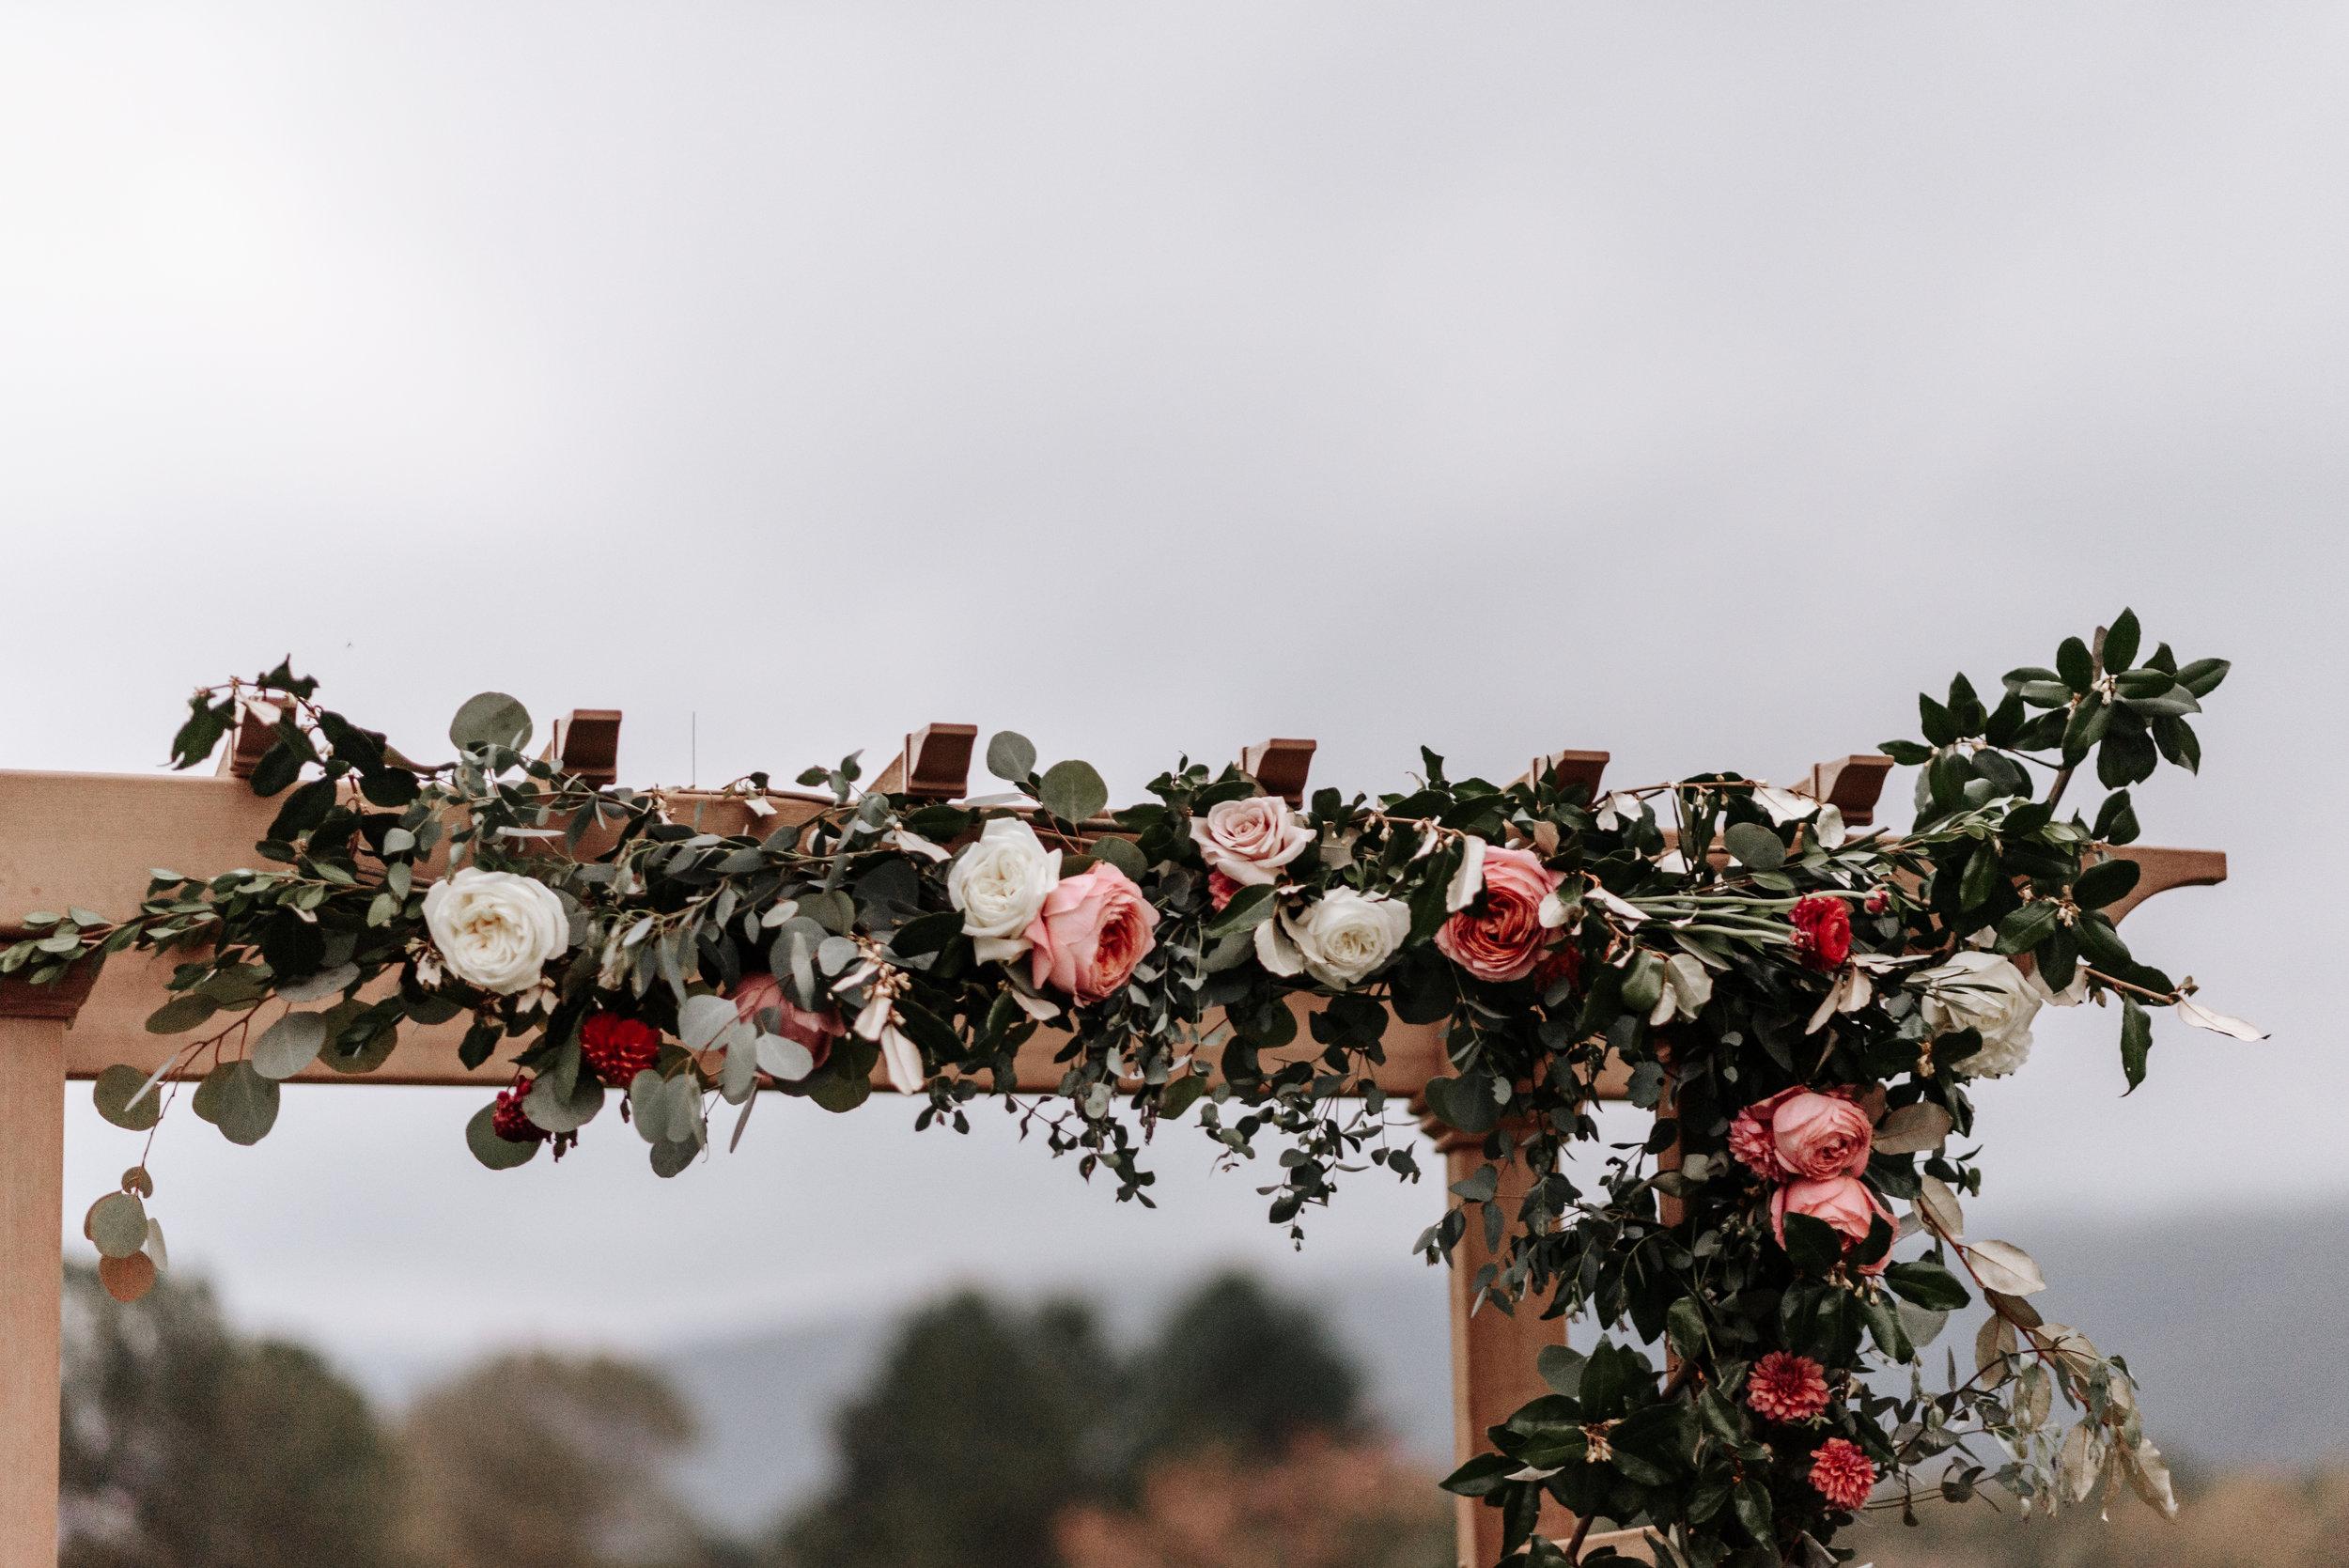 Veritas-Vineyards-and-Winery-Wedding-Photography-Afton-Virginia-Yasmin-Seth-Photography-by-V-2960.jpg